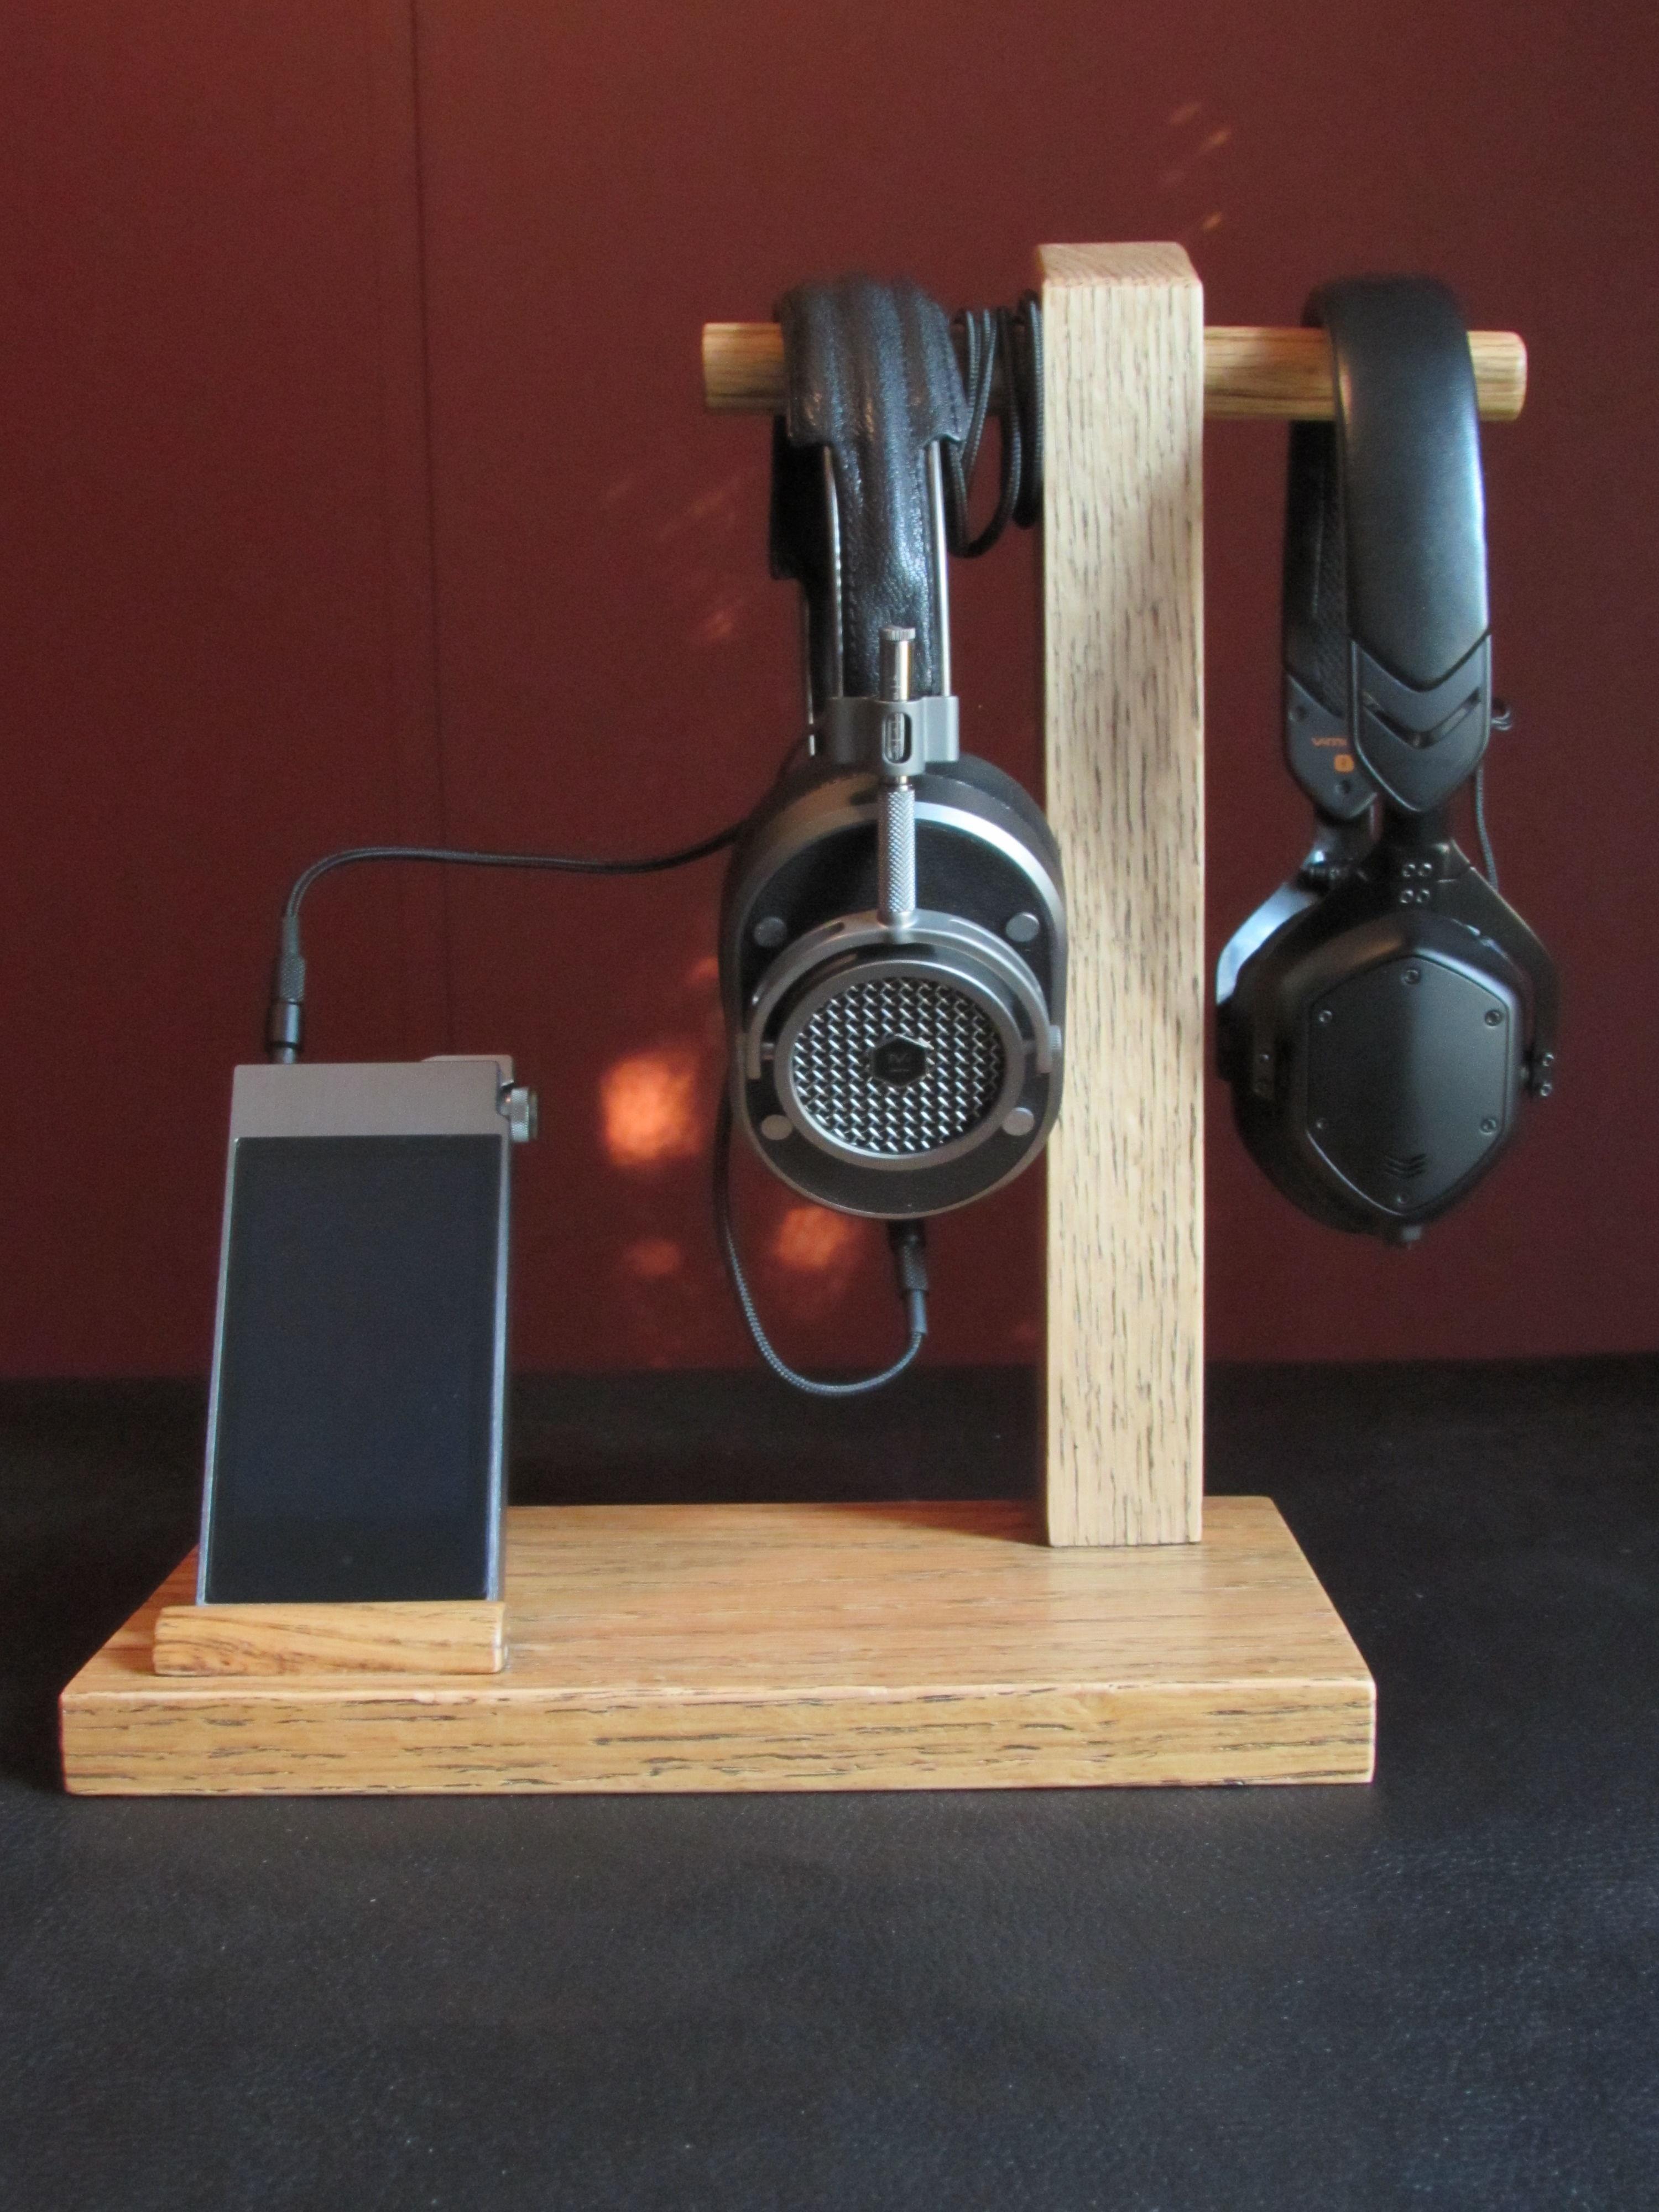 THE DIY HEADPHONE STAND THREAD | Page 219 | Headphone ...